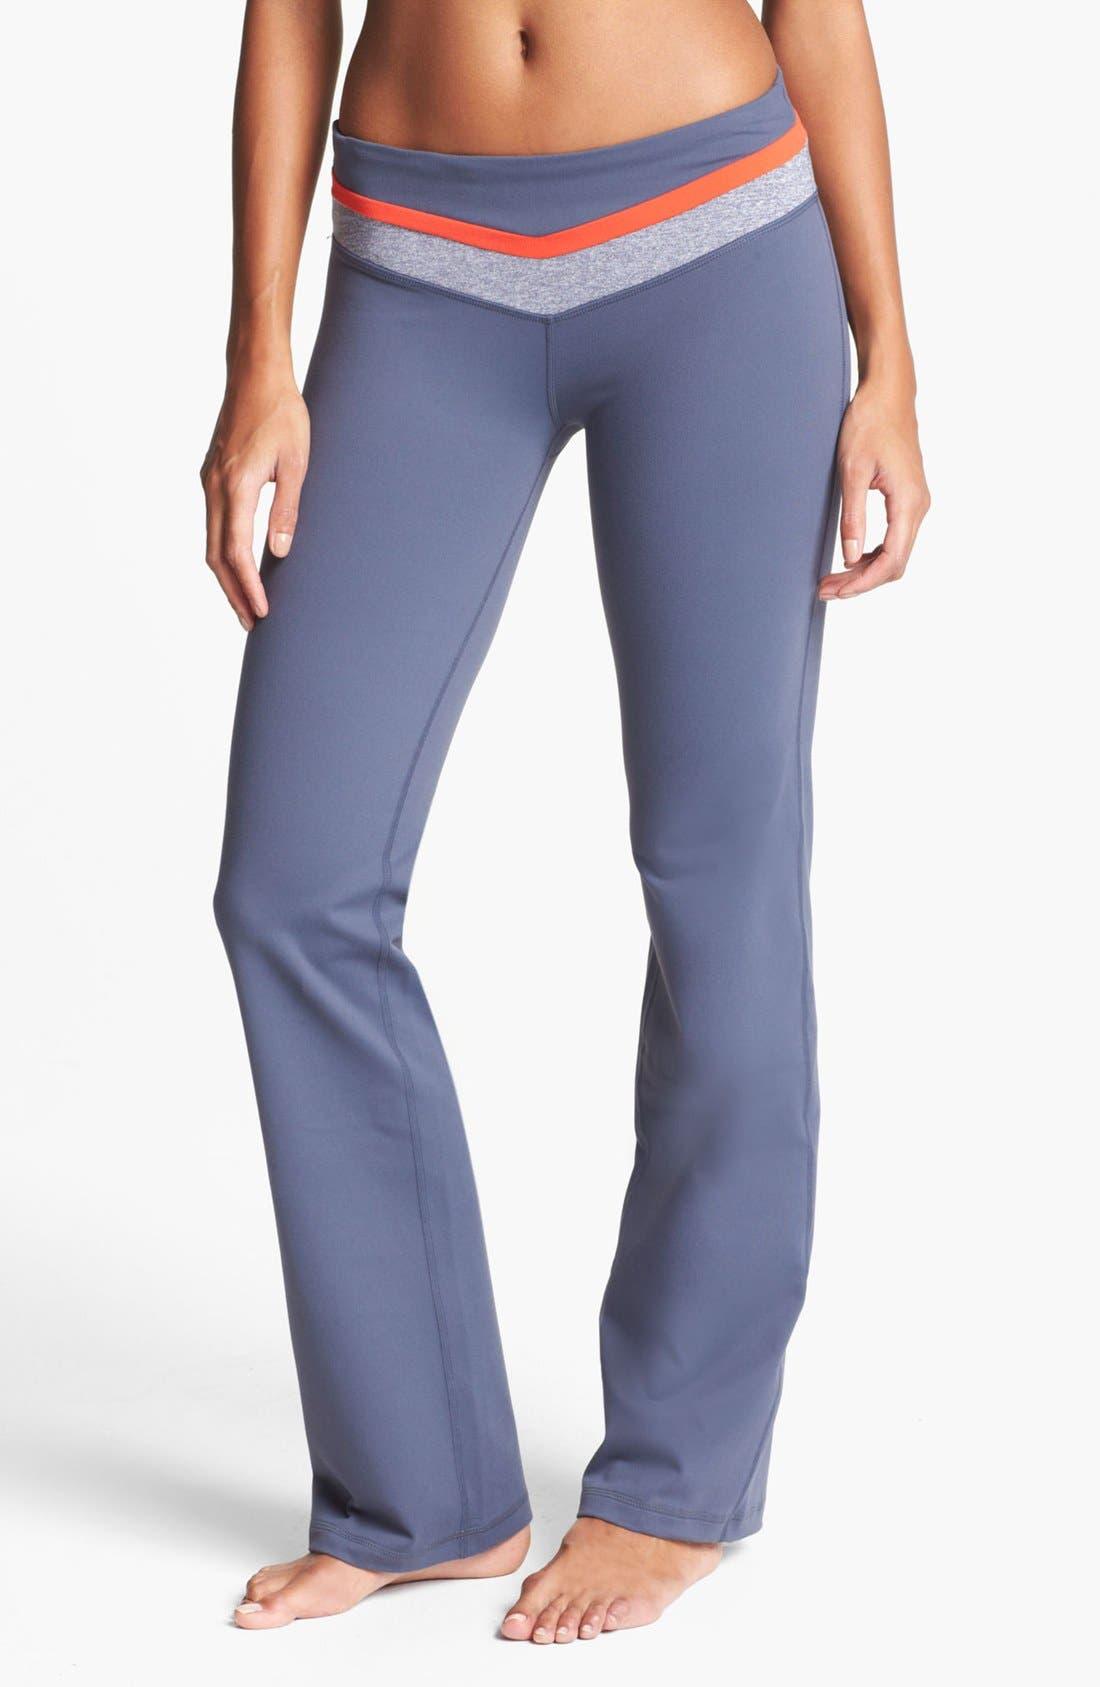 Alternate Image 1 Selected - Zella 'Booty' Colorblock Waist Pants